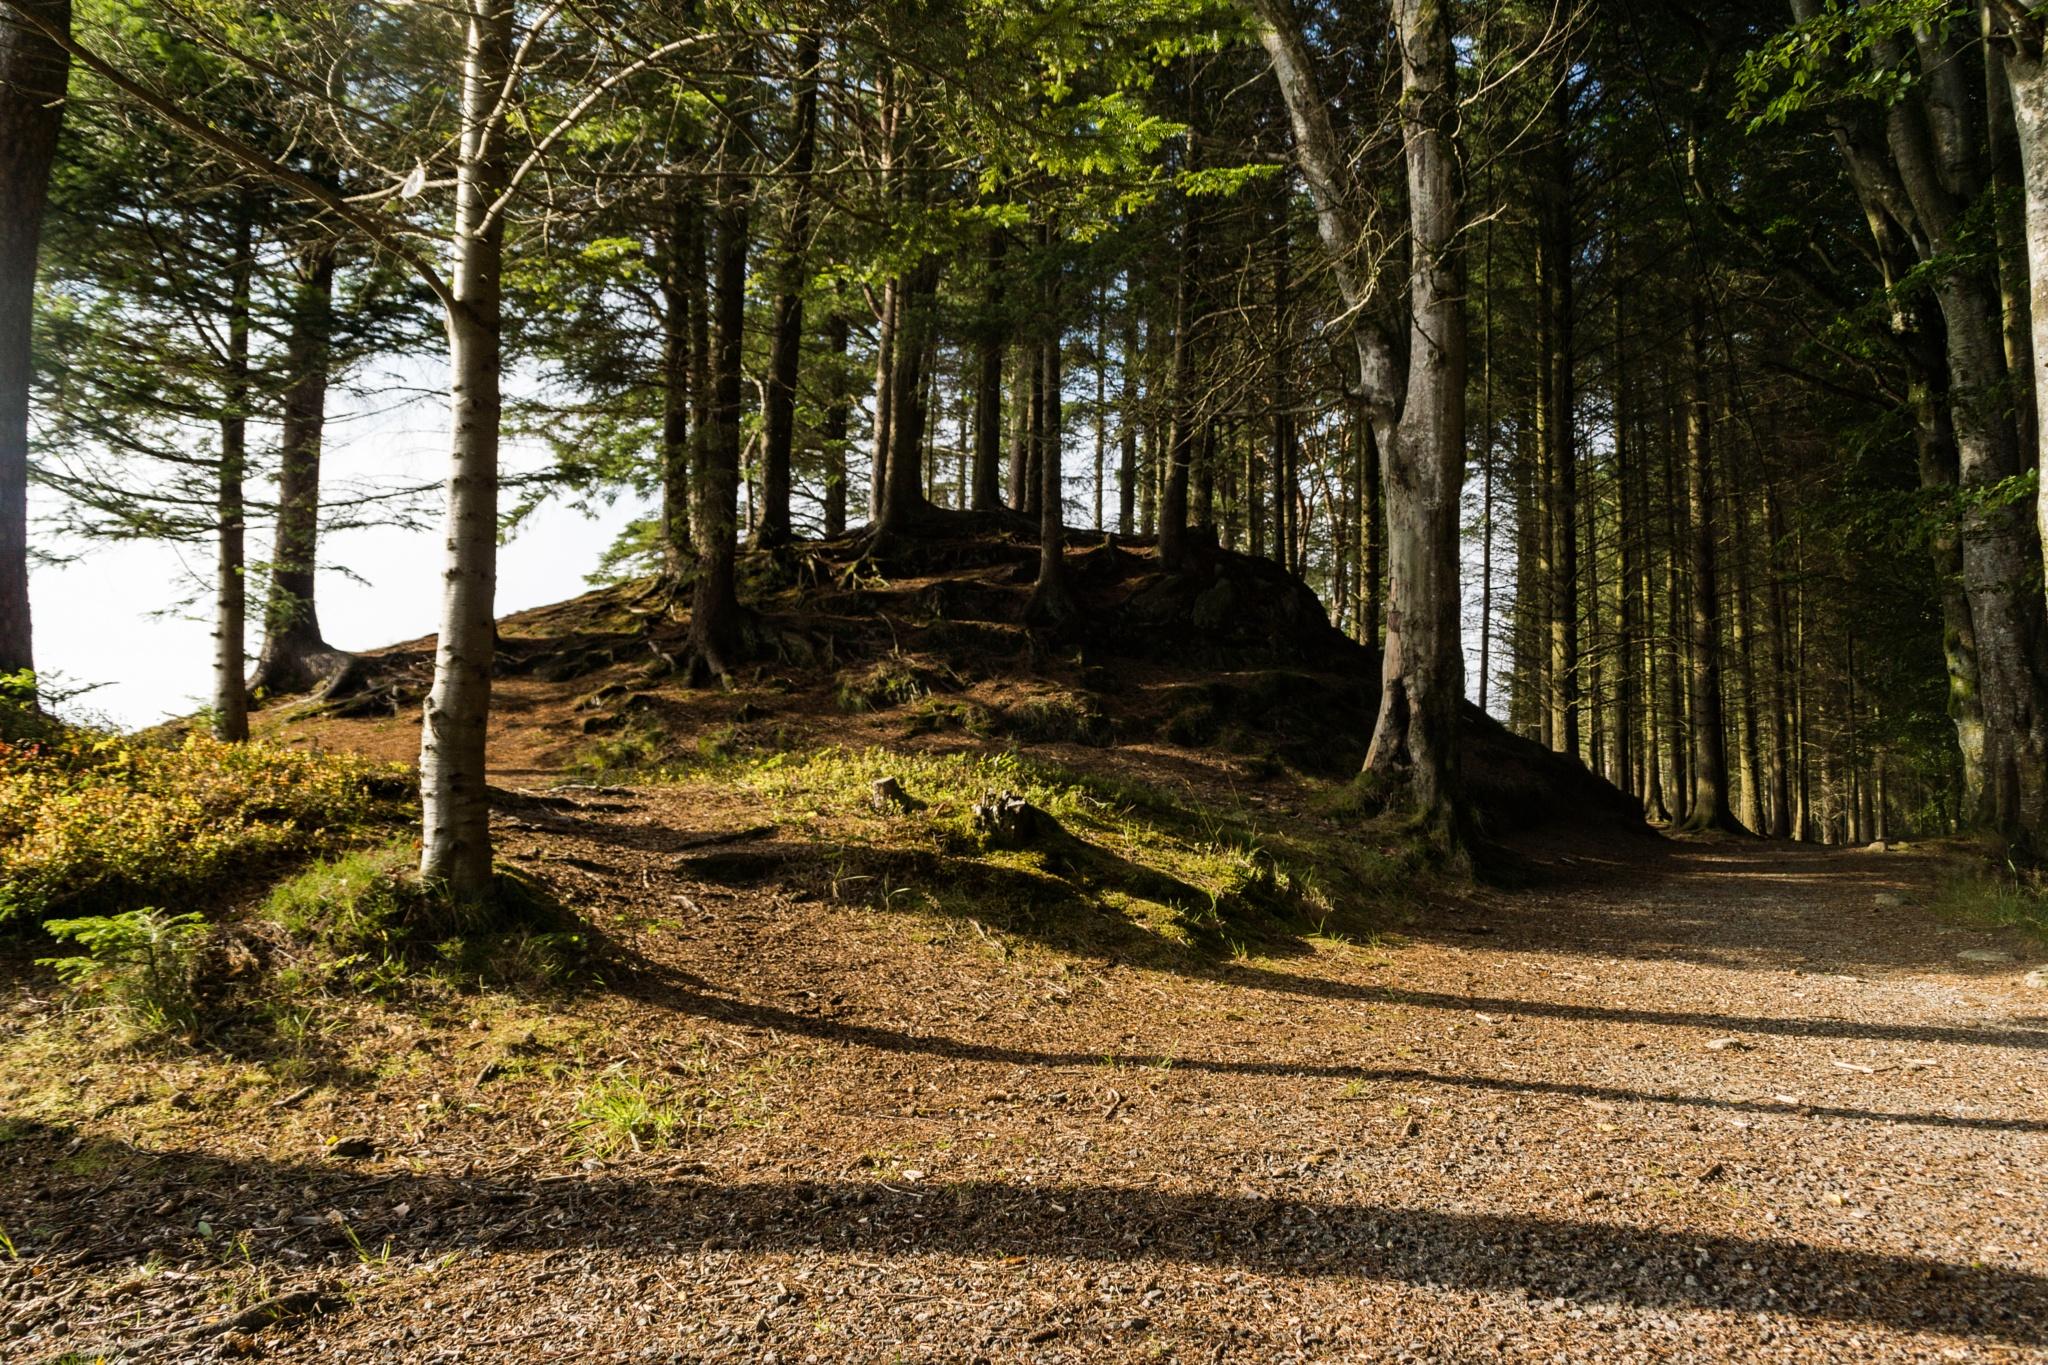 Trees and shadows by Tormod Lindoe